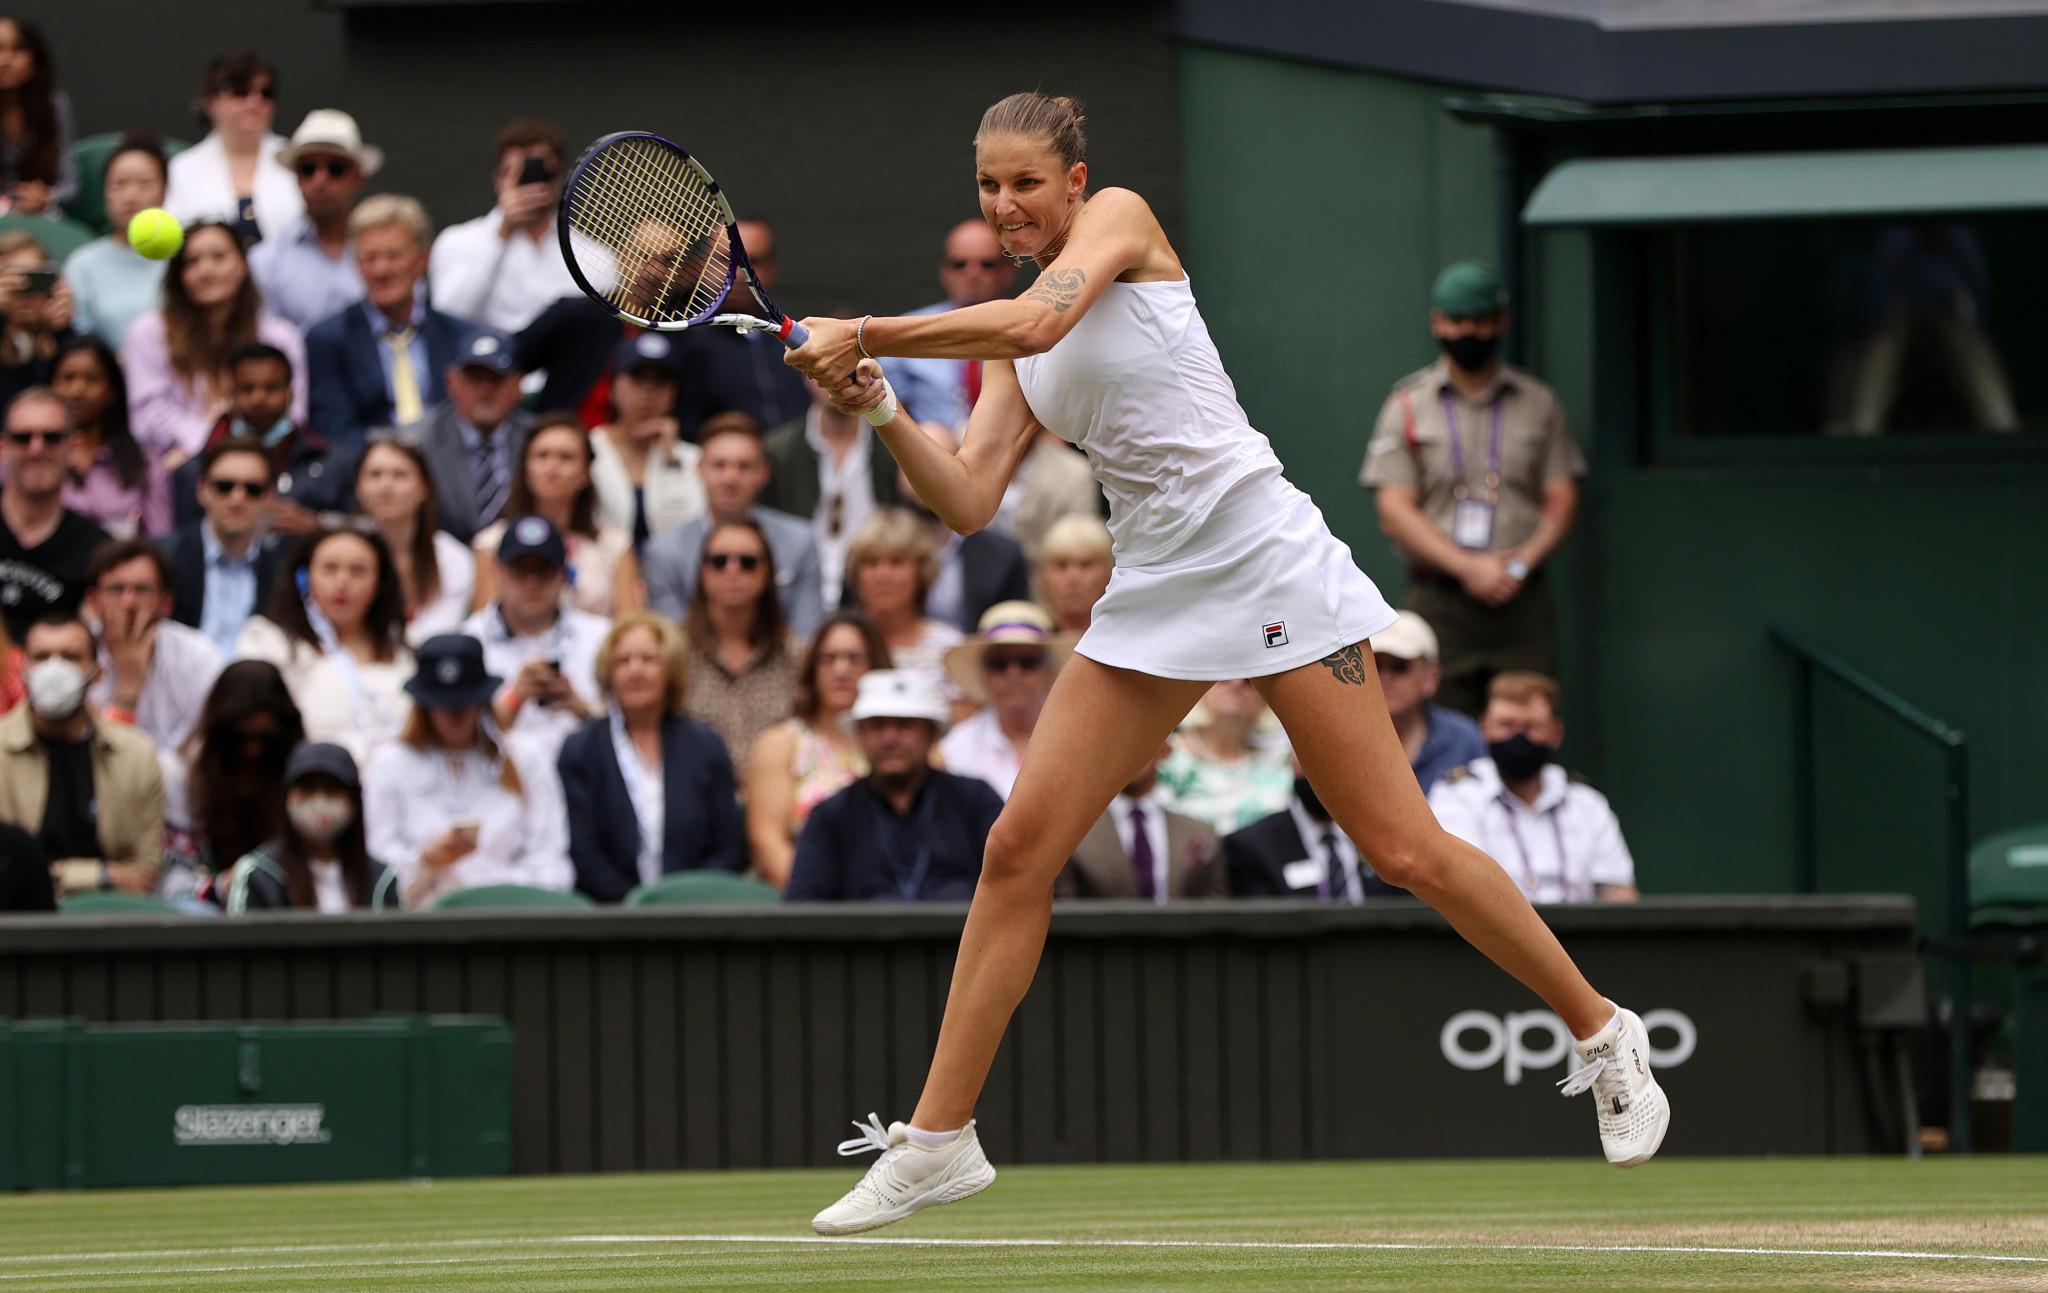 Karolina Plíšková forced the match into a decider after winning the second set tiebreak ©Getty Images